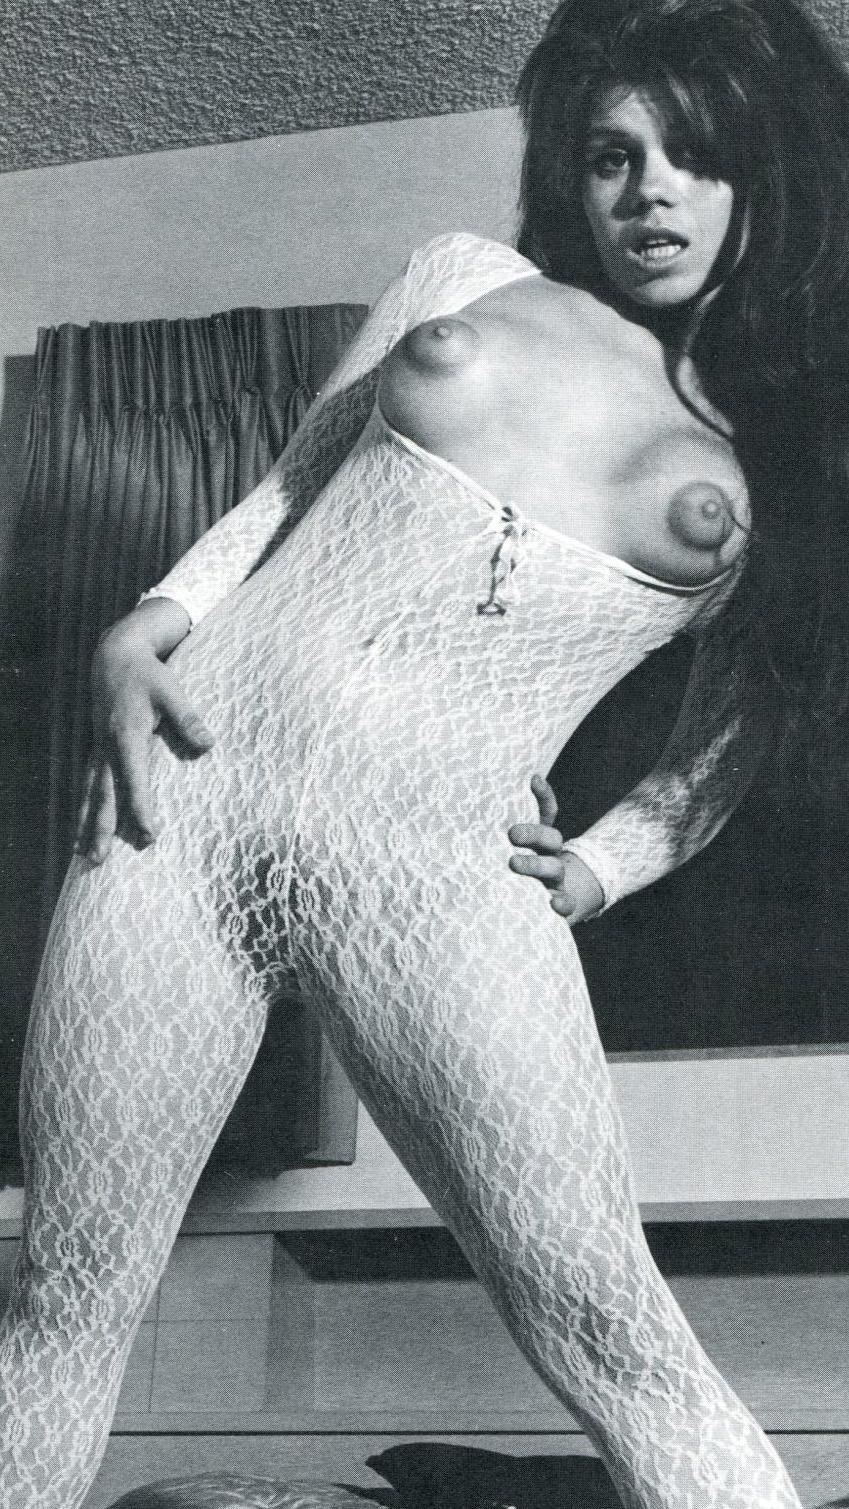 vintage-bodystocking